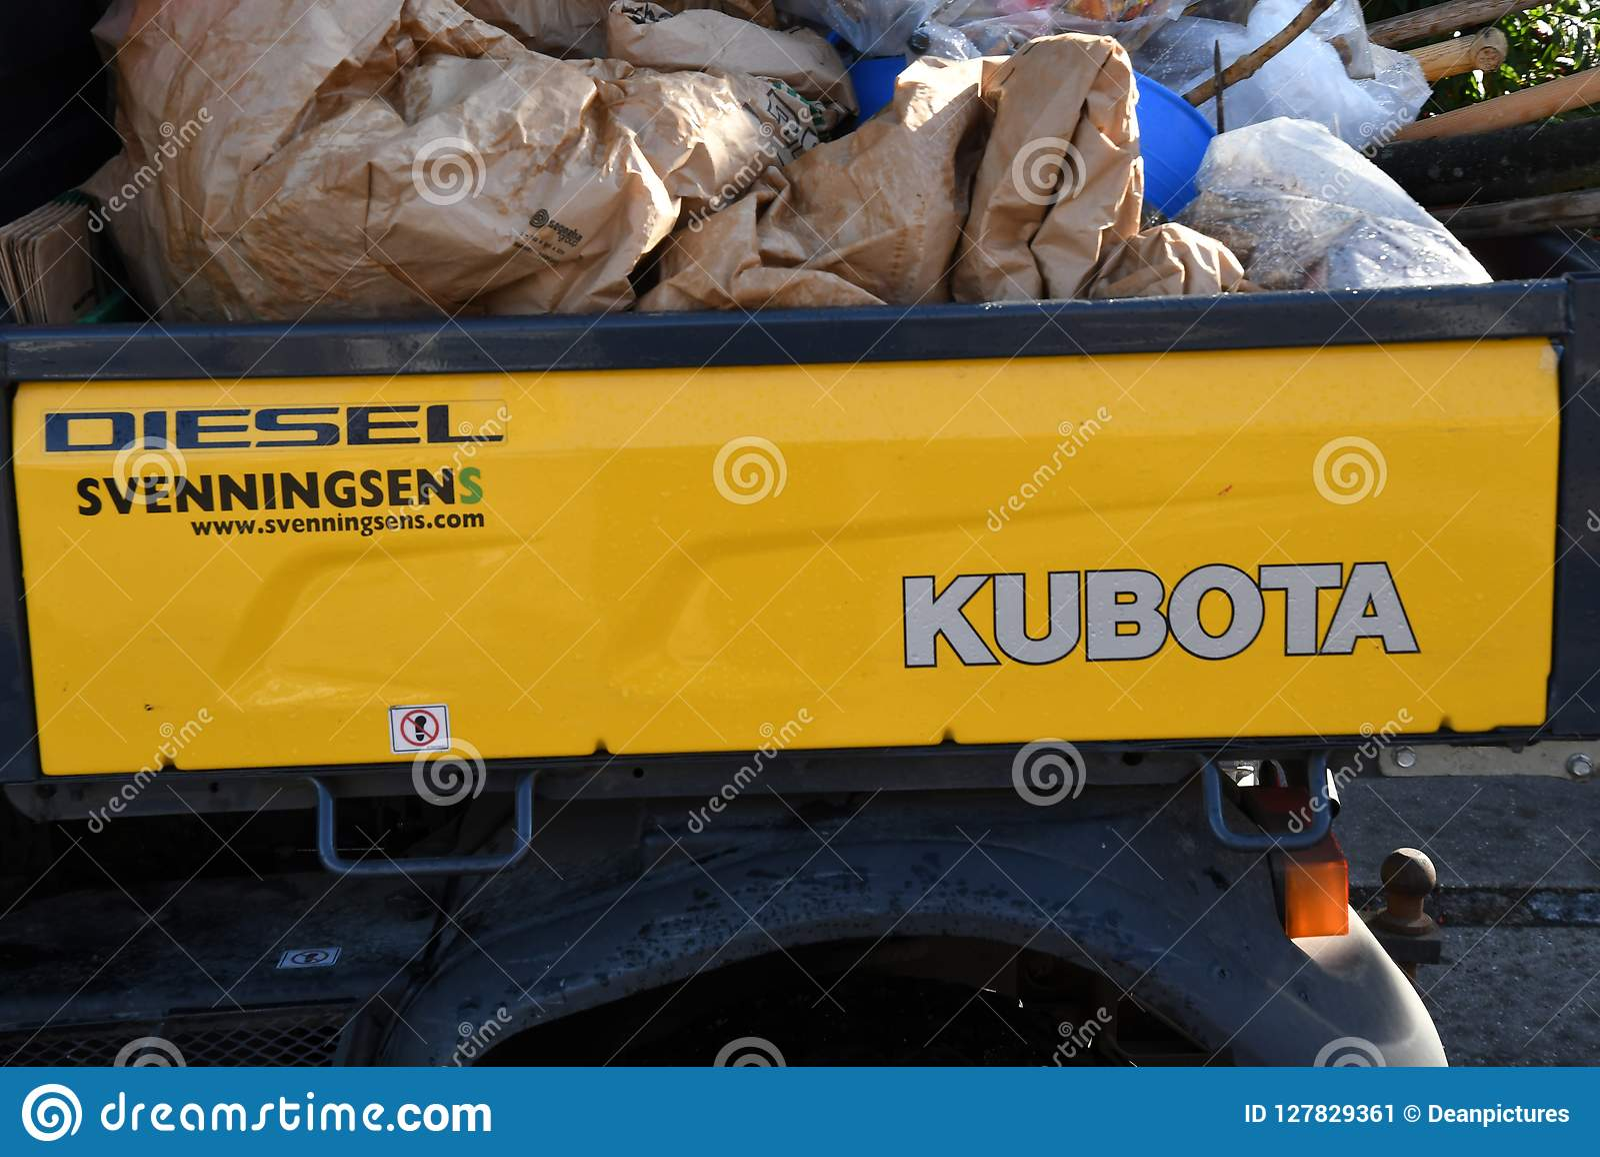 KUBOTA TRACKTOR DRIVES ON DIESE� TRANSPORT WASTE